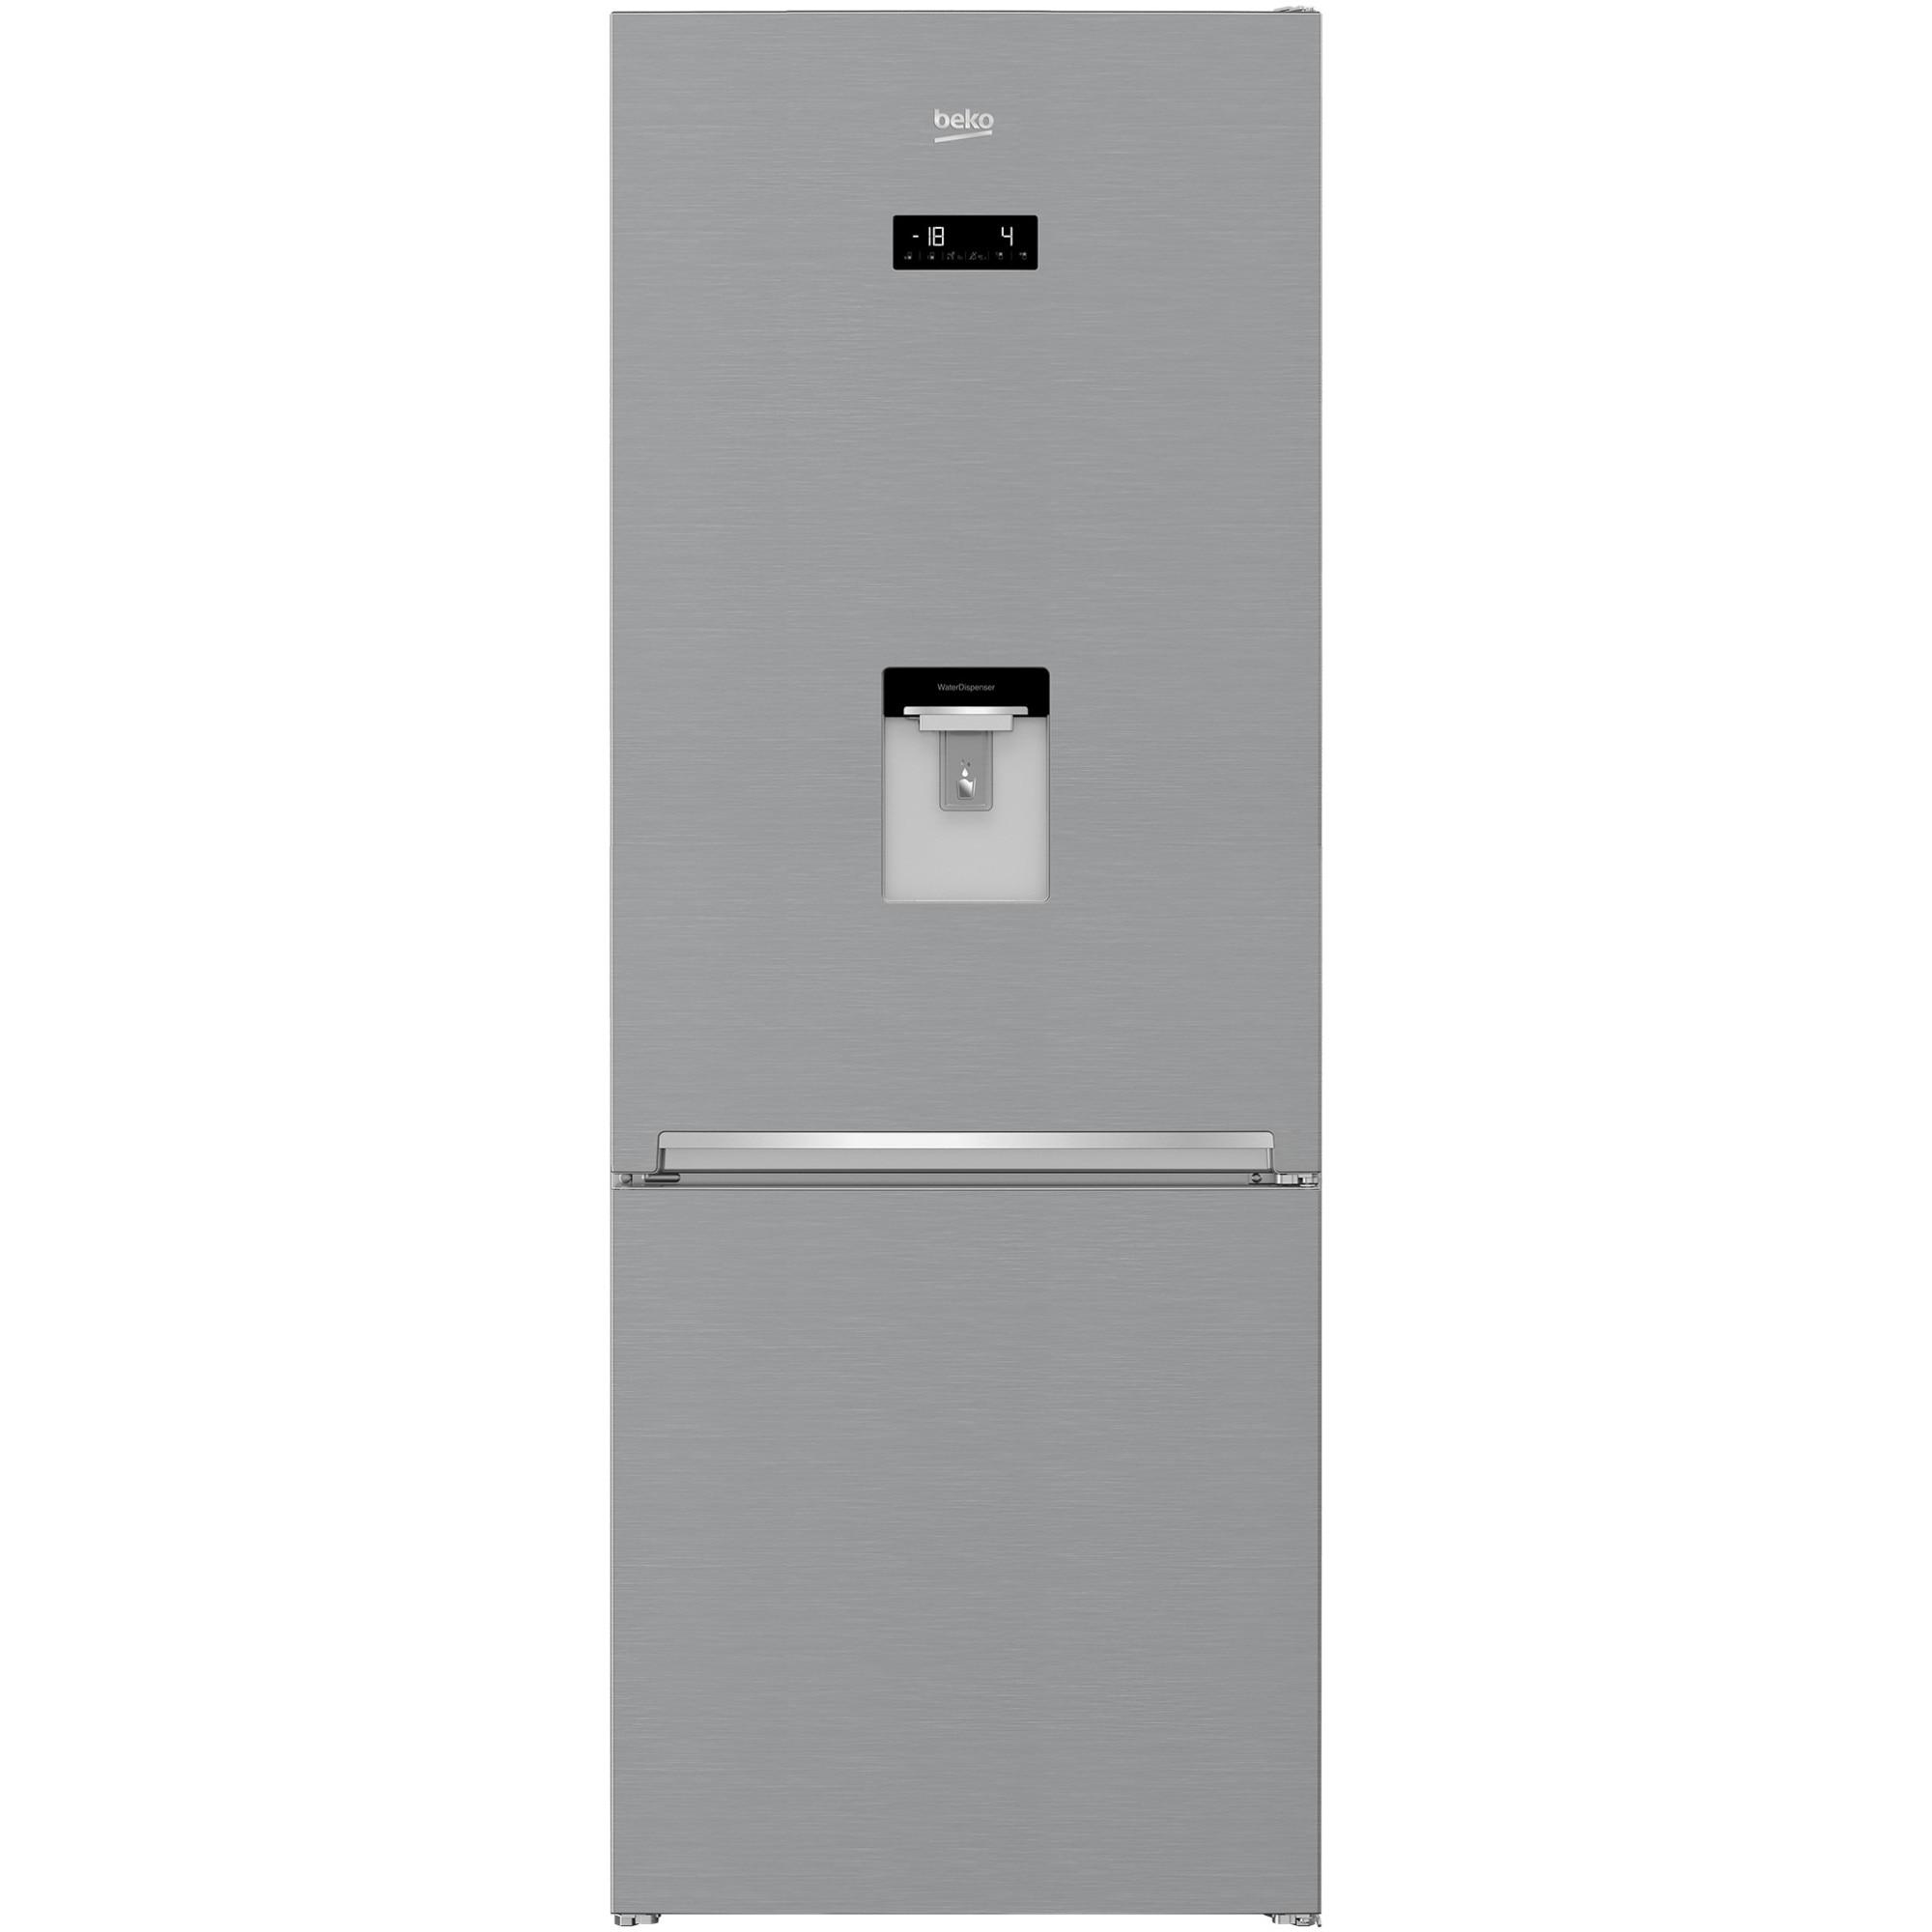 Fotografie Combina frigorifica Beko RCNE560E40DZXBN, 510 l, Clasa E, NeoFrost Dual Cooling , HarvestFresh, Everfresh+, Dozator de apa, H 192 cm, Argintiu